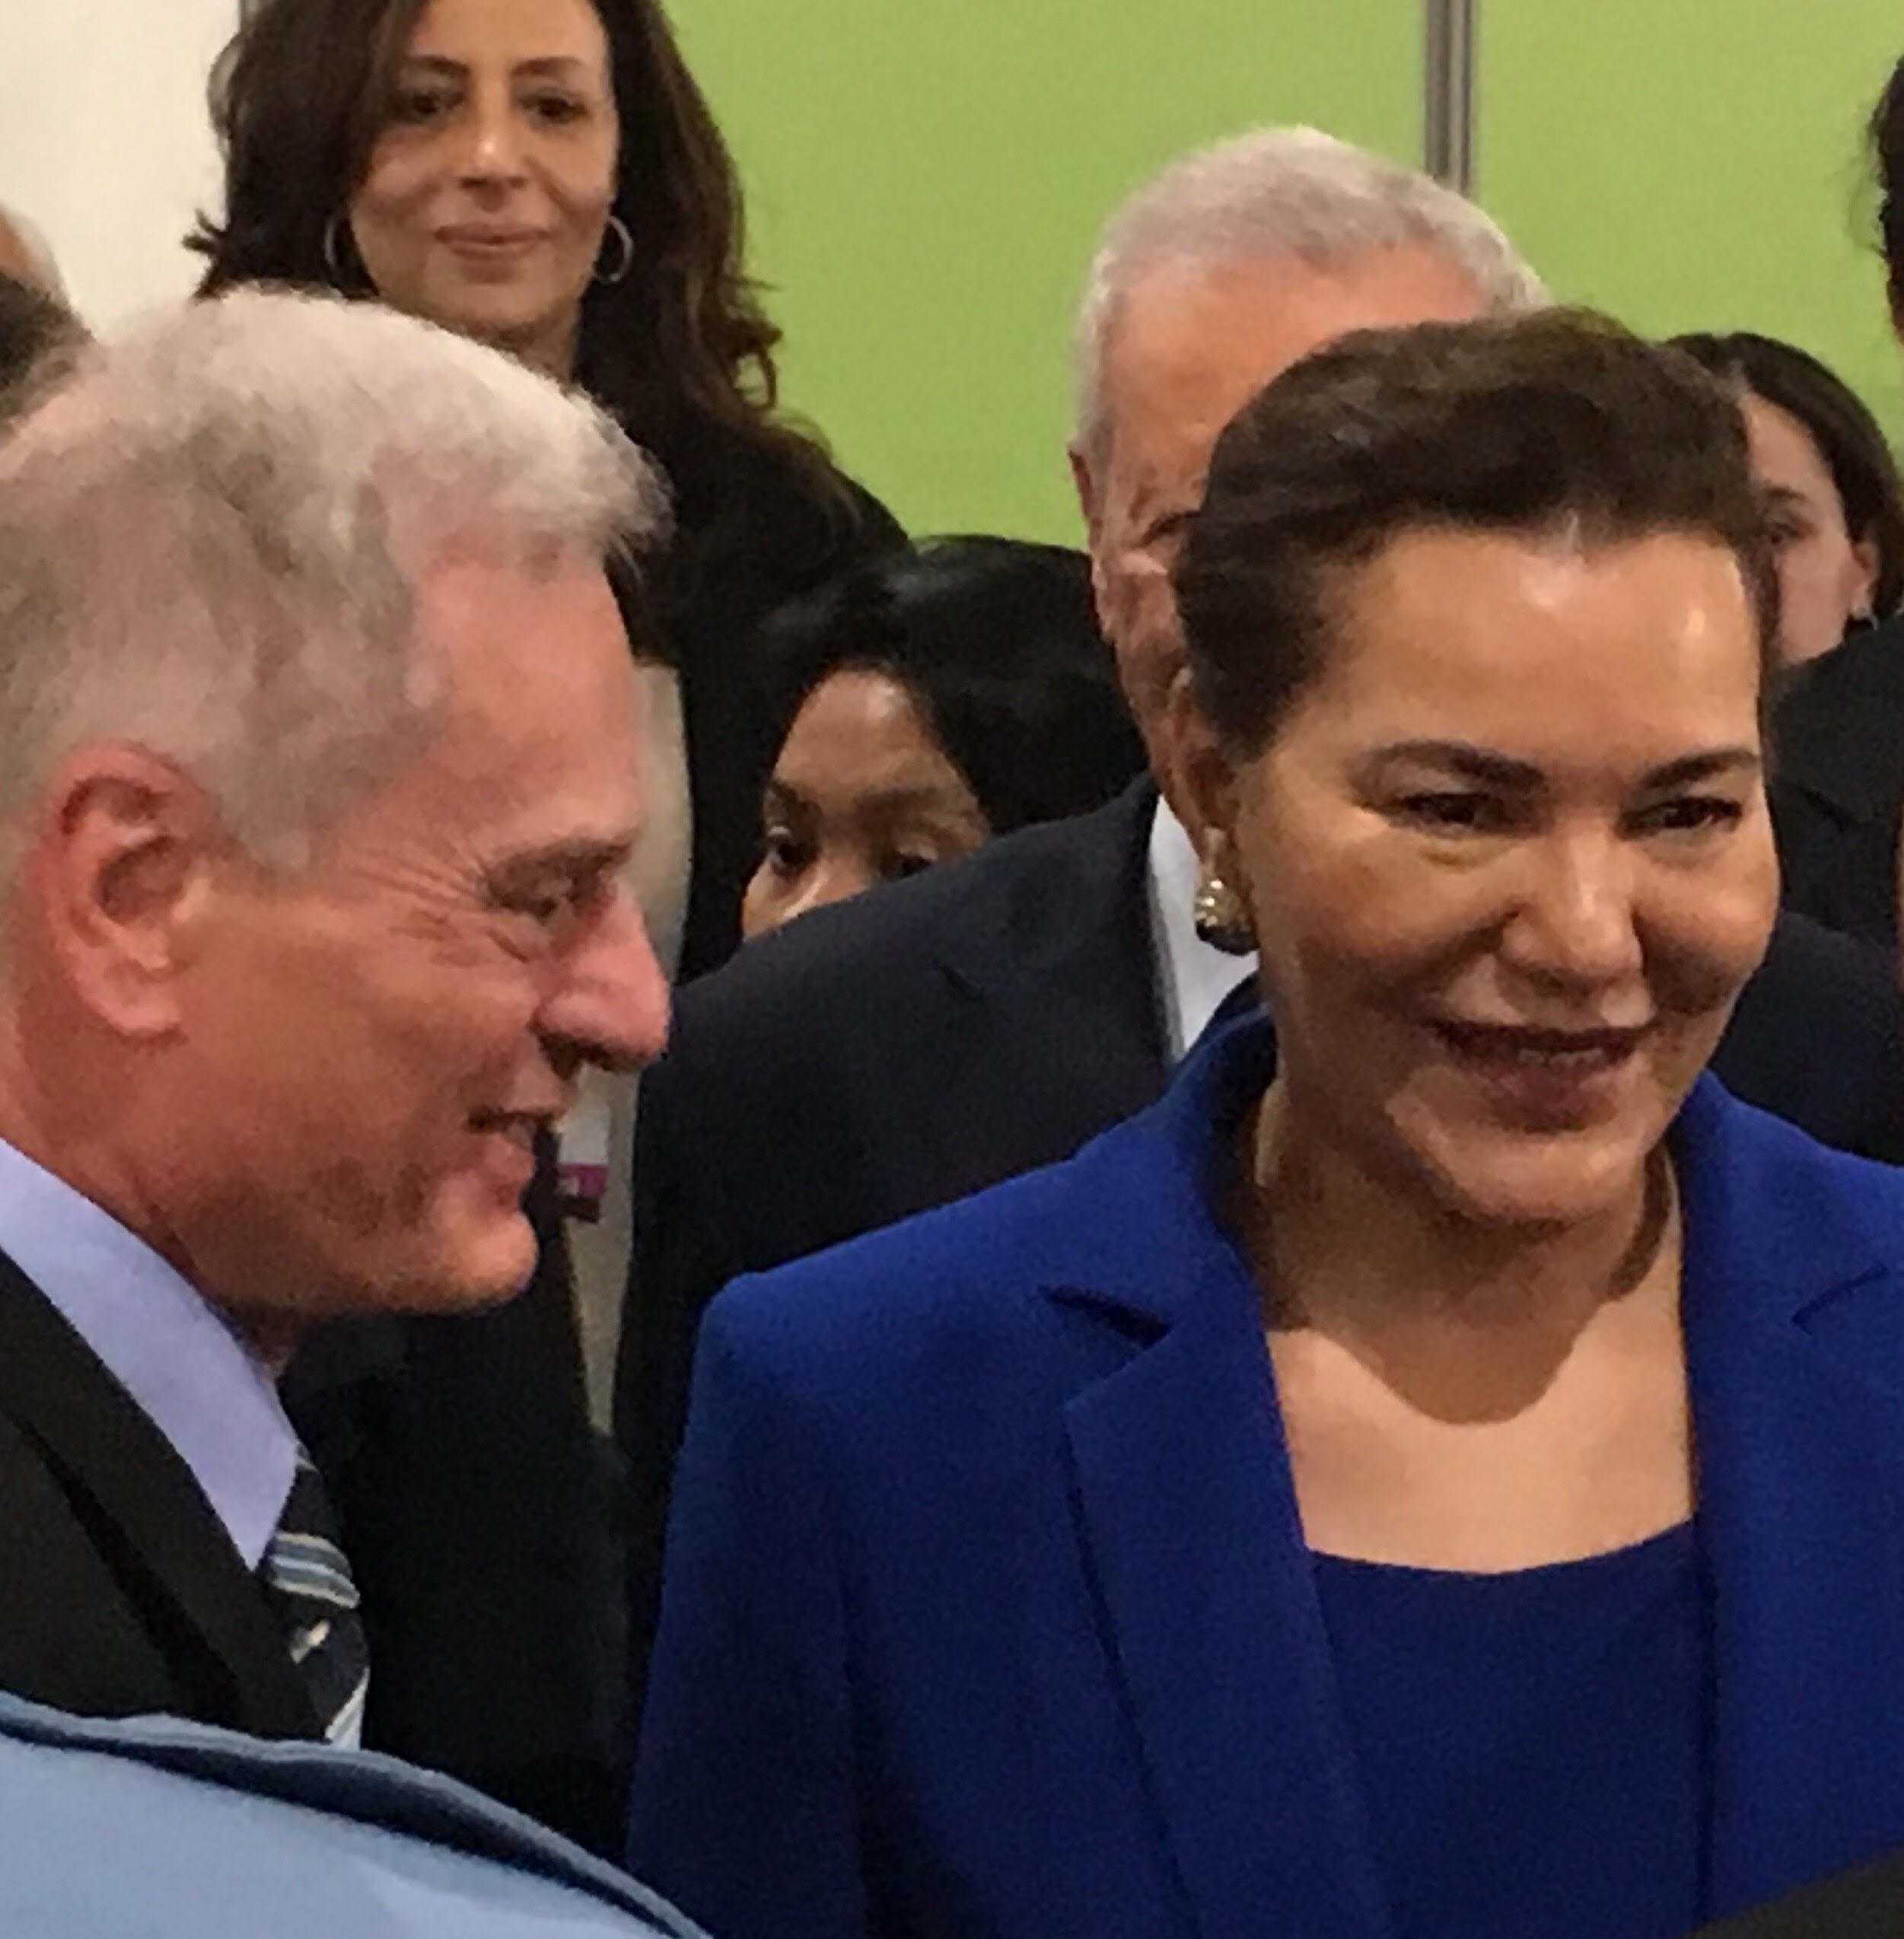 20161114 COP22 Mario Salomone and Princess Lalla Hasnaa 3